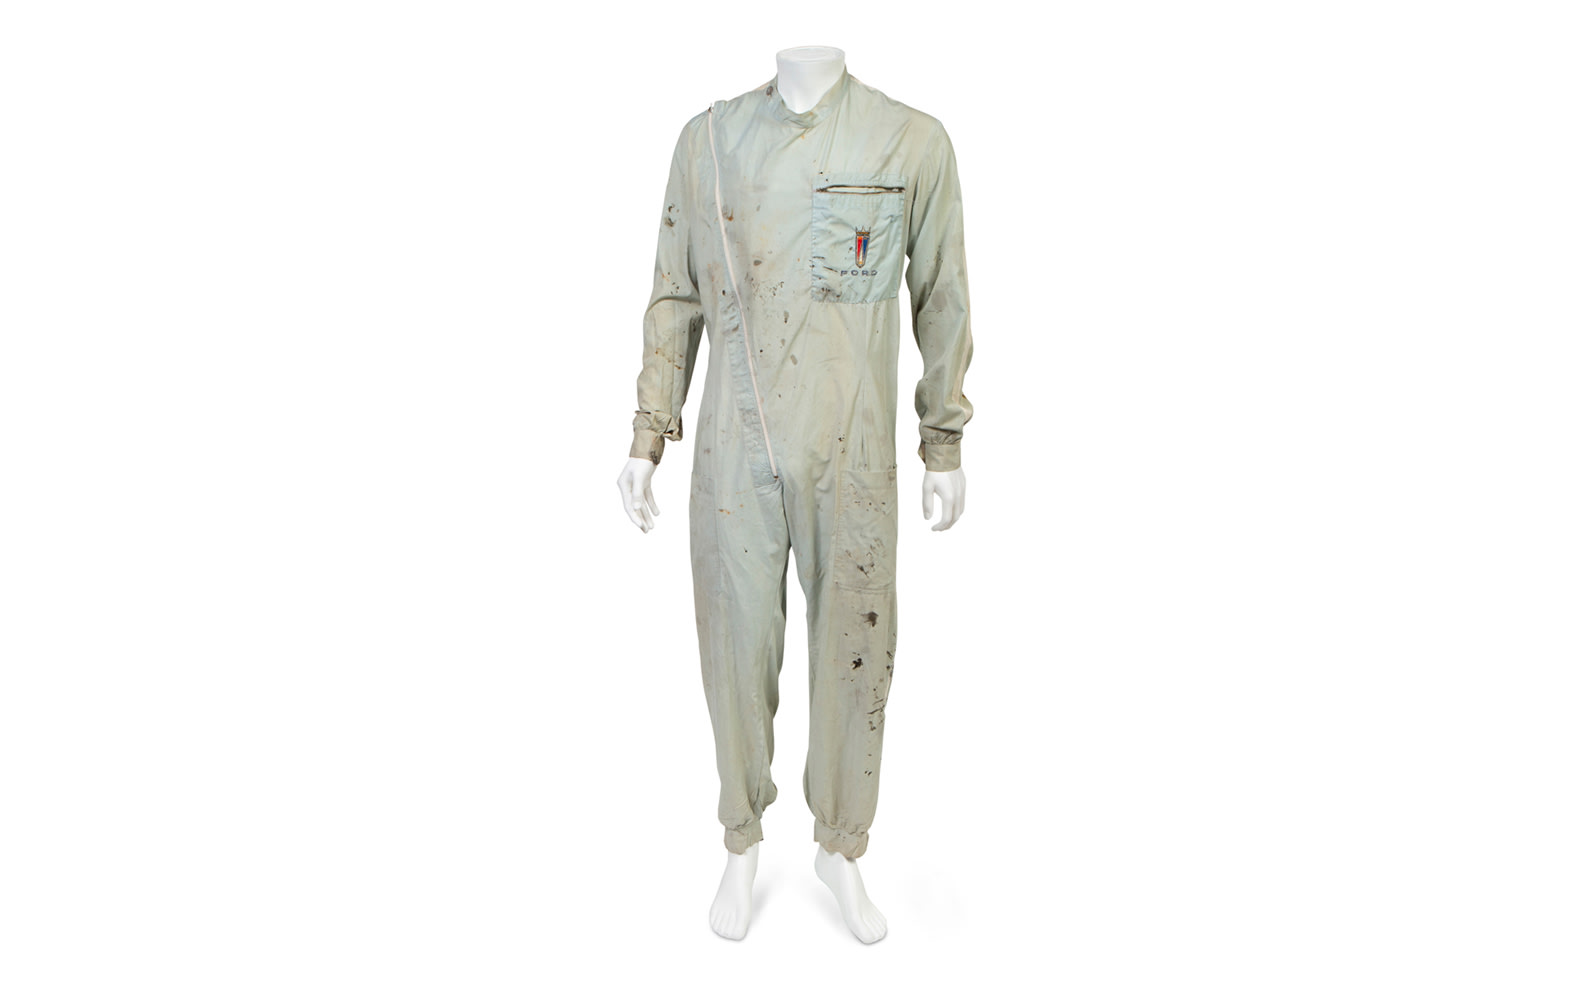 Prod/O21C - Phil Hill B 2021/B0261_Practical Uniforms London One-Piece Driving Suit/B0261_Practical_Uniforms_London_Driving_Suit_2_pqwh9r